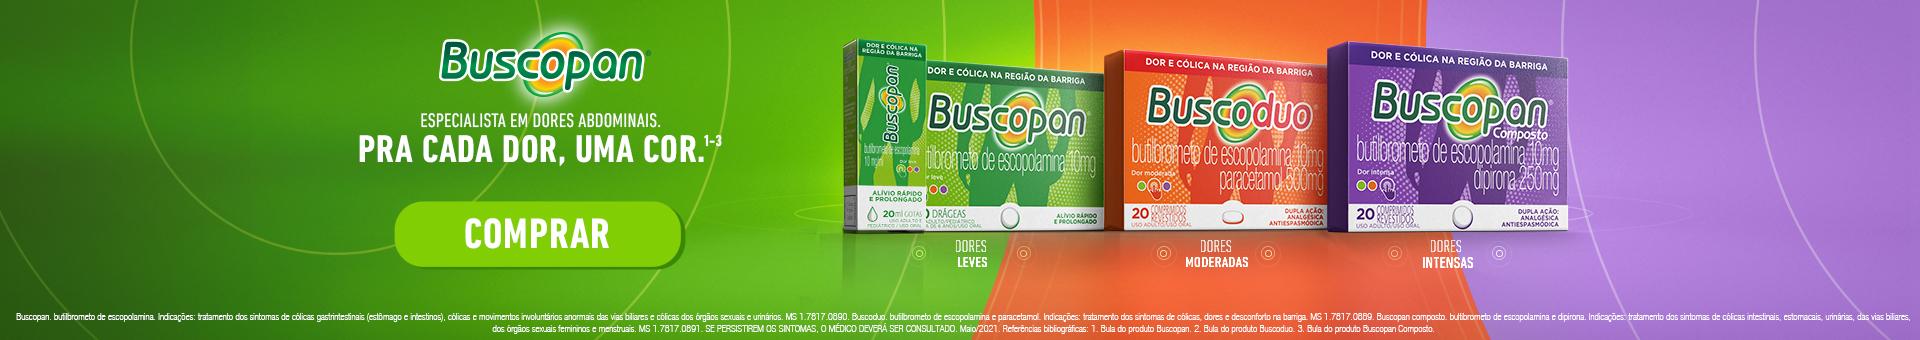 Banner Buscopan Maio